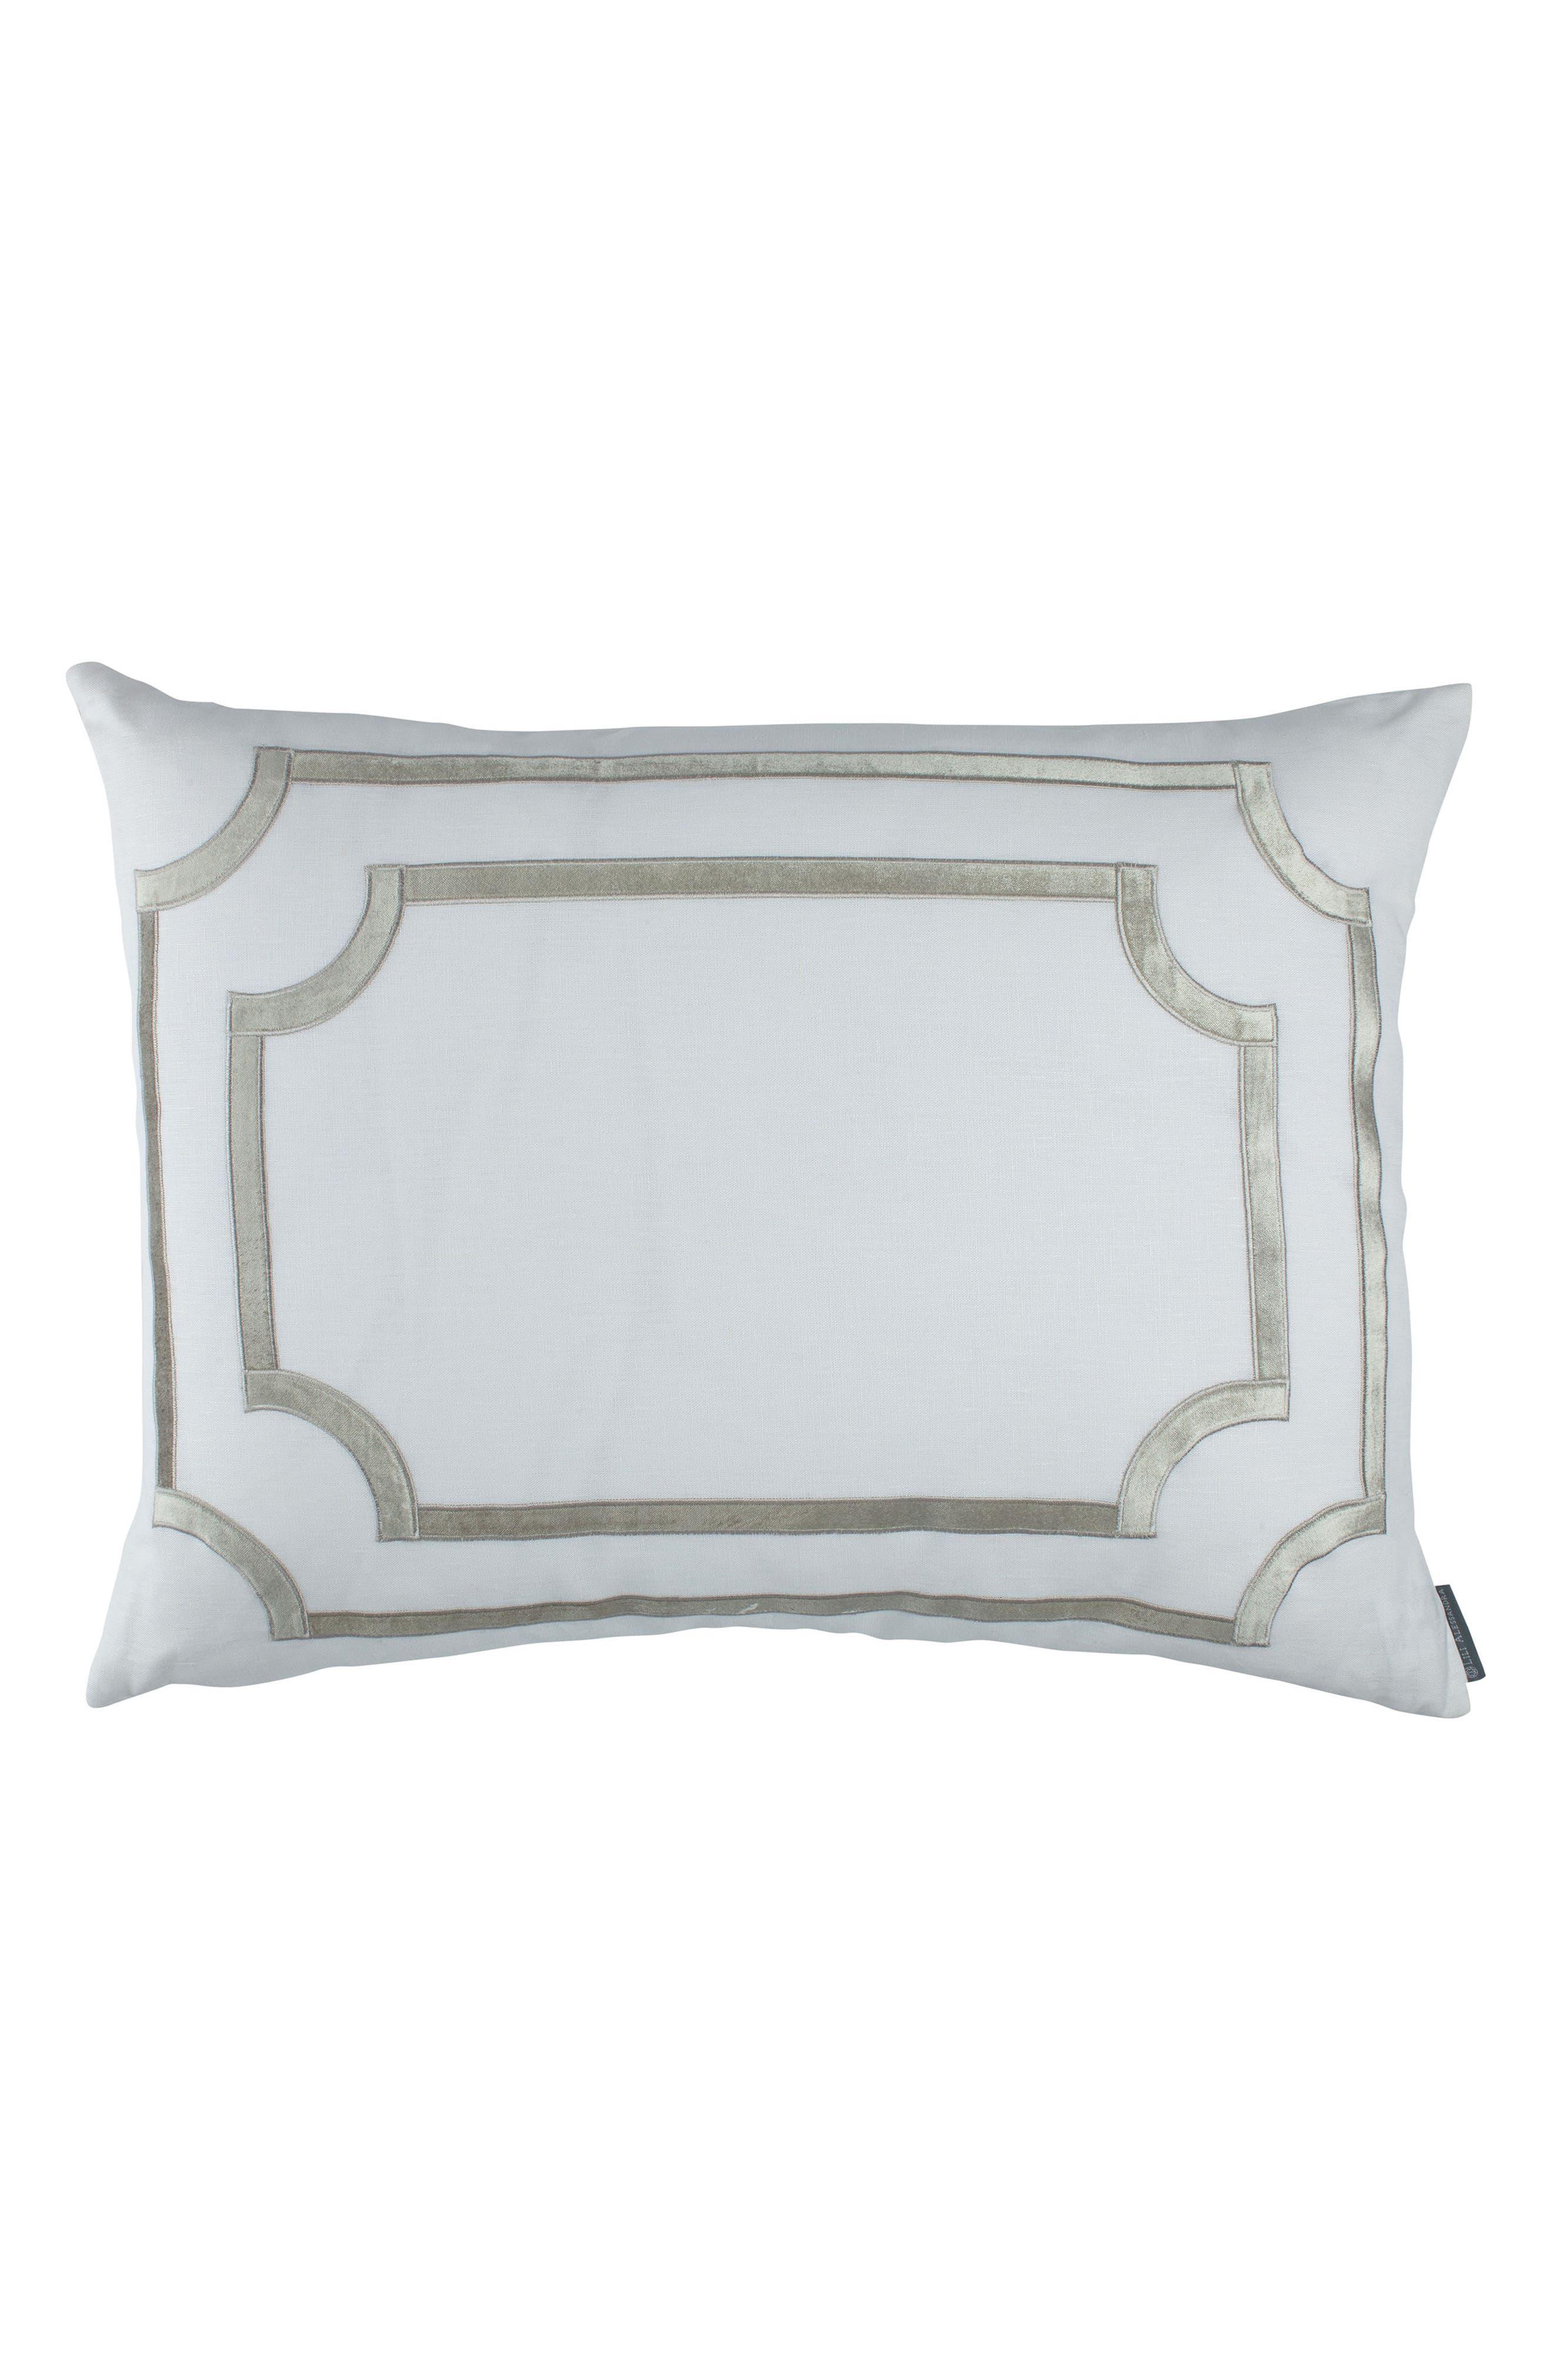 SoHo Sham,                         Main,                         color, White Ice Silver